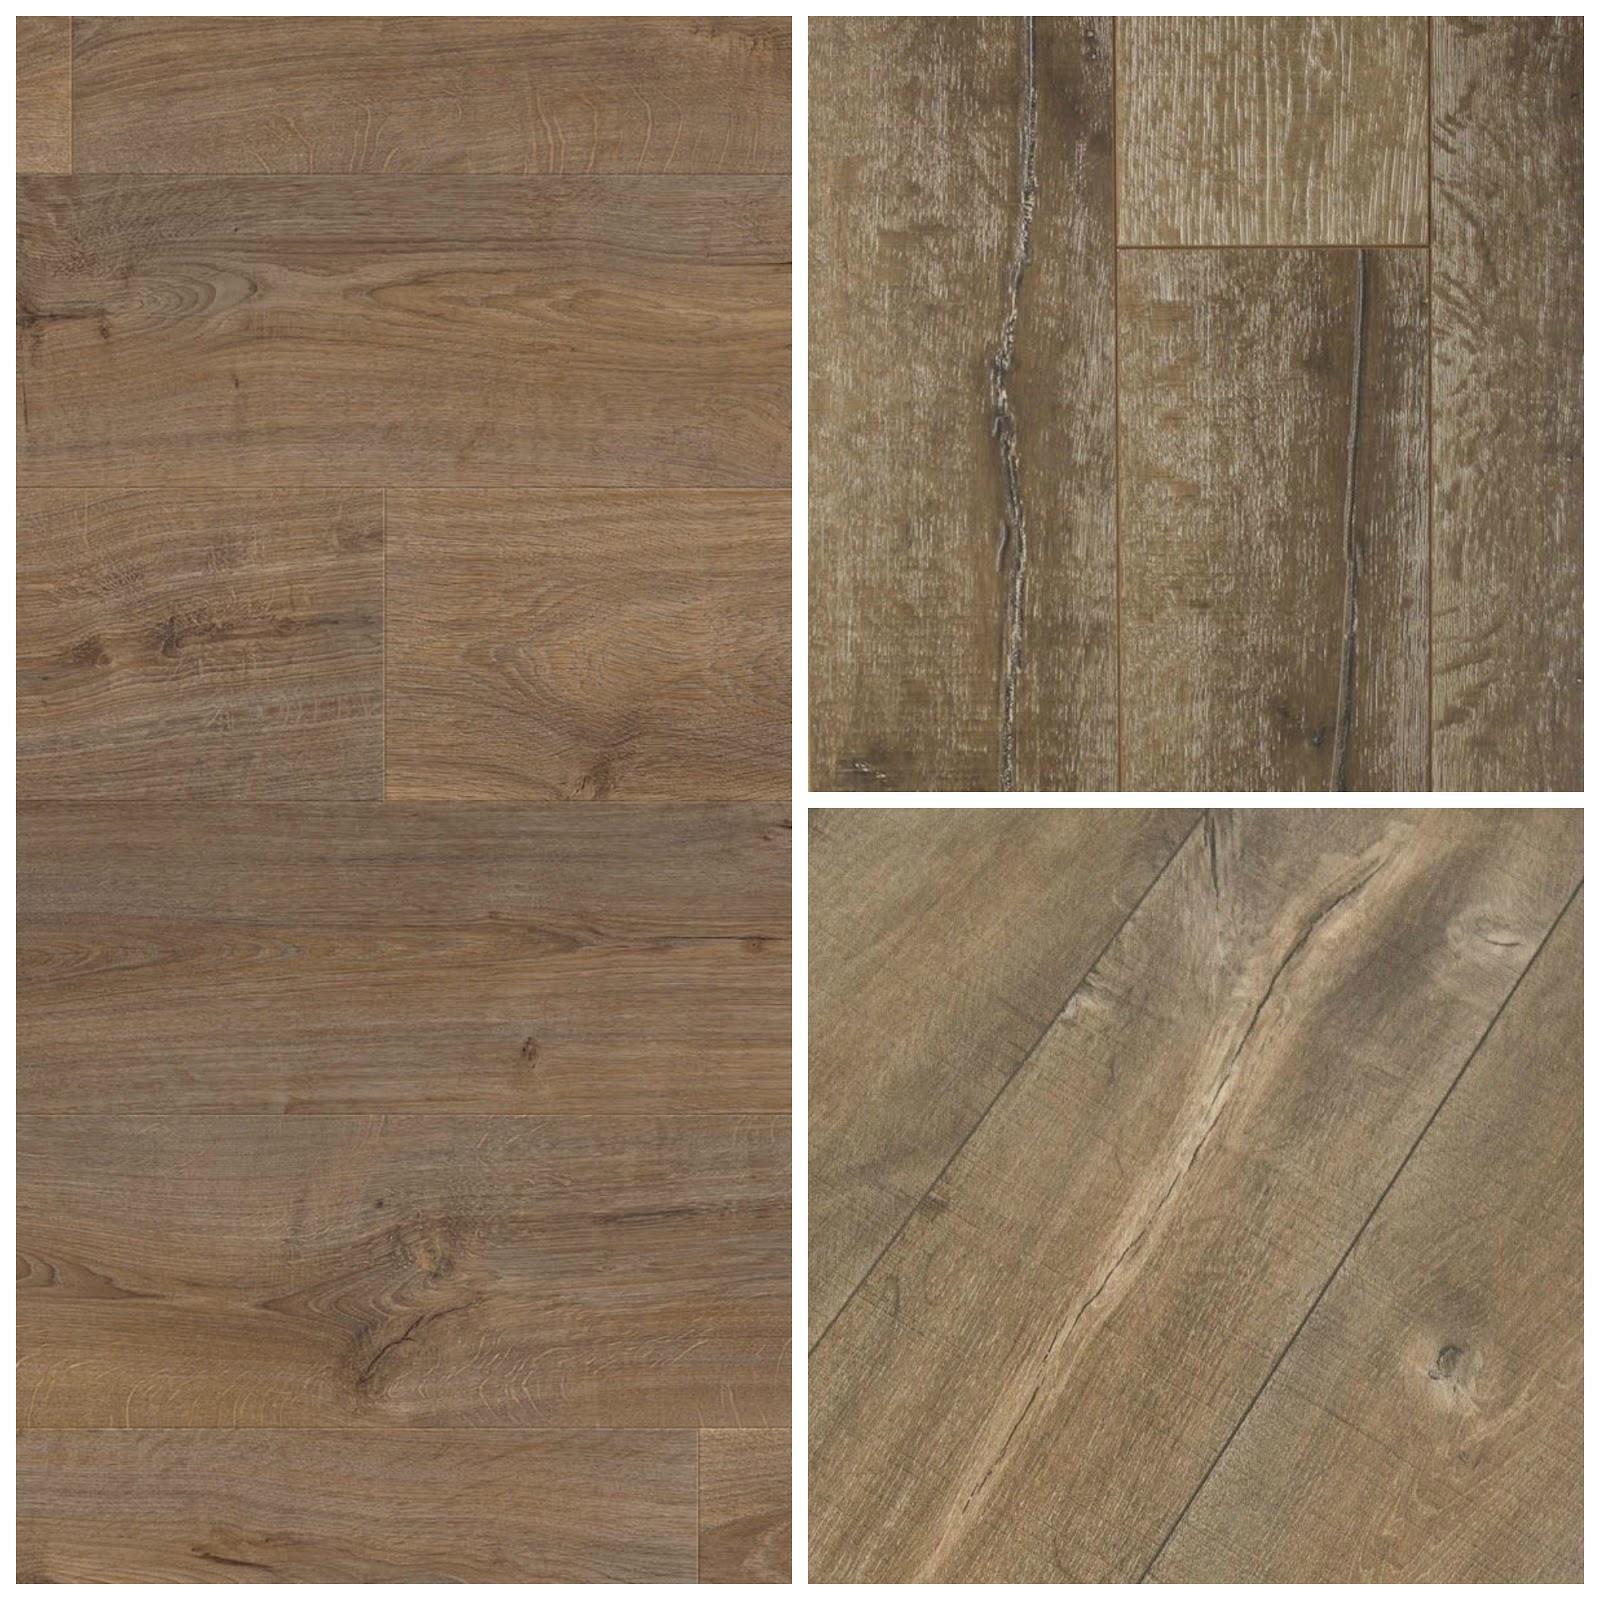 Laminate Flooring For Basement laminate flooring in a basement house of hepworths pinterest costco carpet design and offices Richmond Laminate Sapphire Mist Quick Step Reclaime Mocha Oak